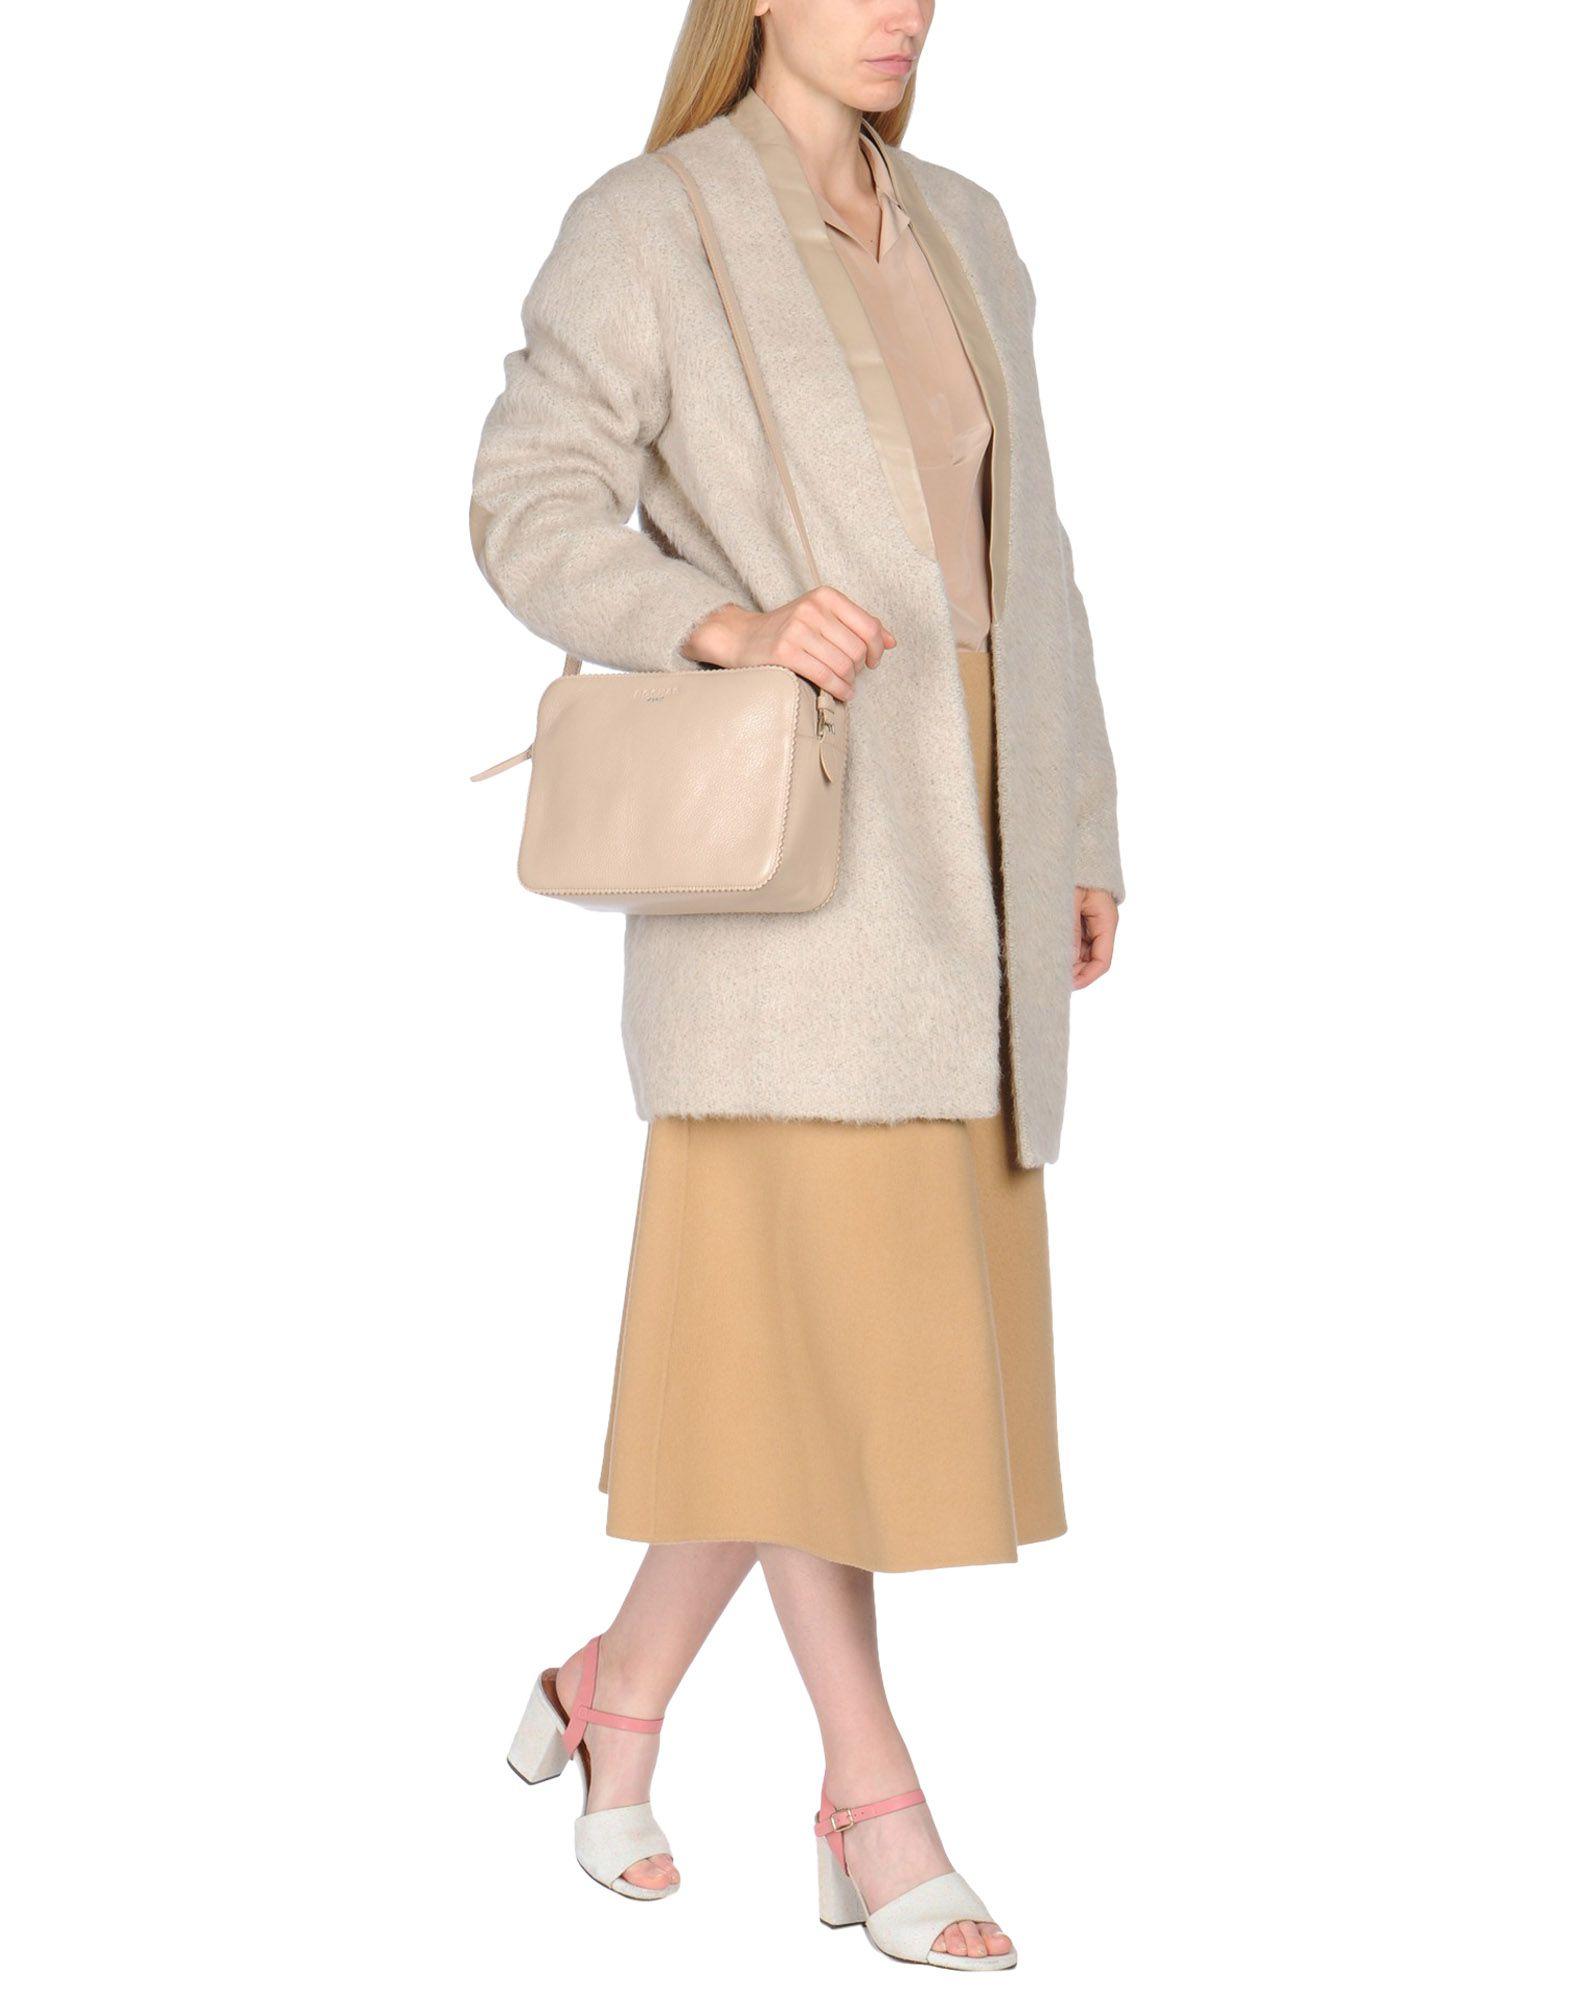 Tibi coats 3